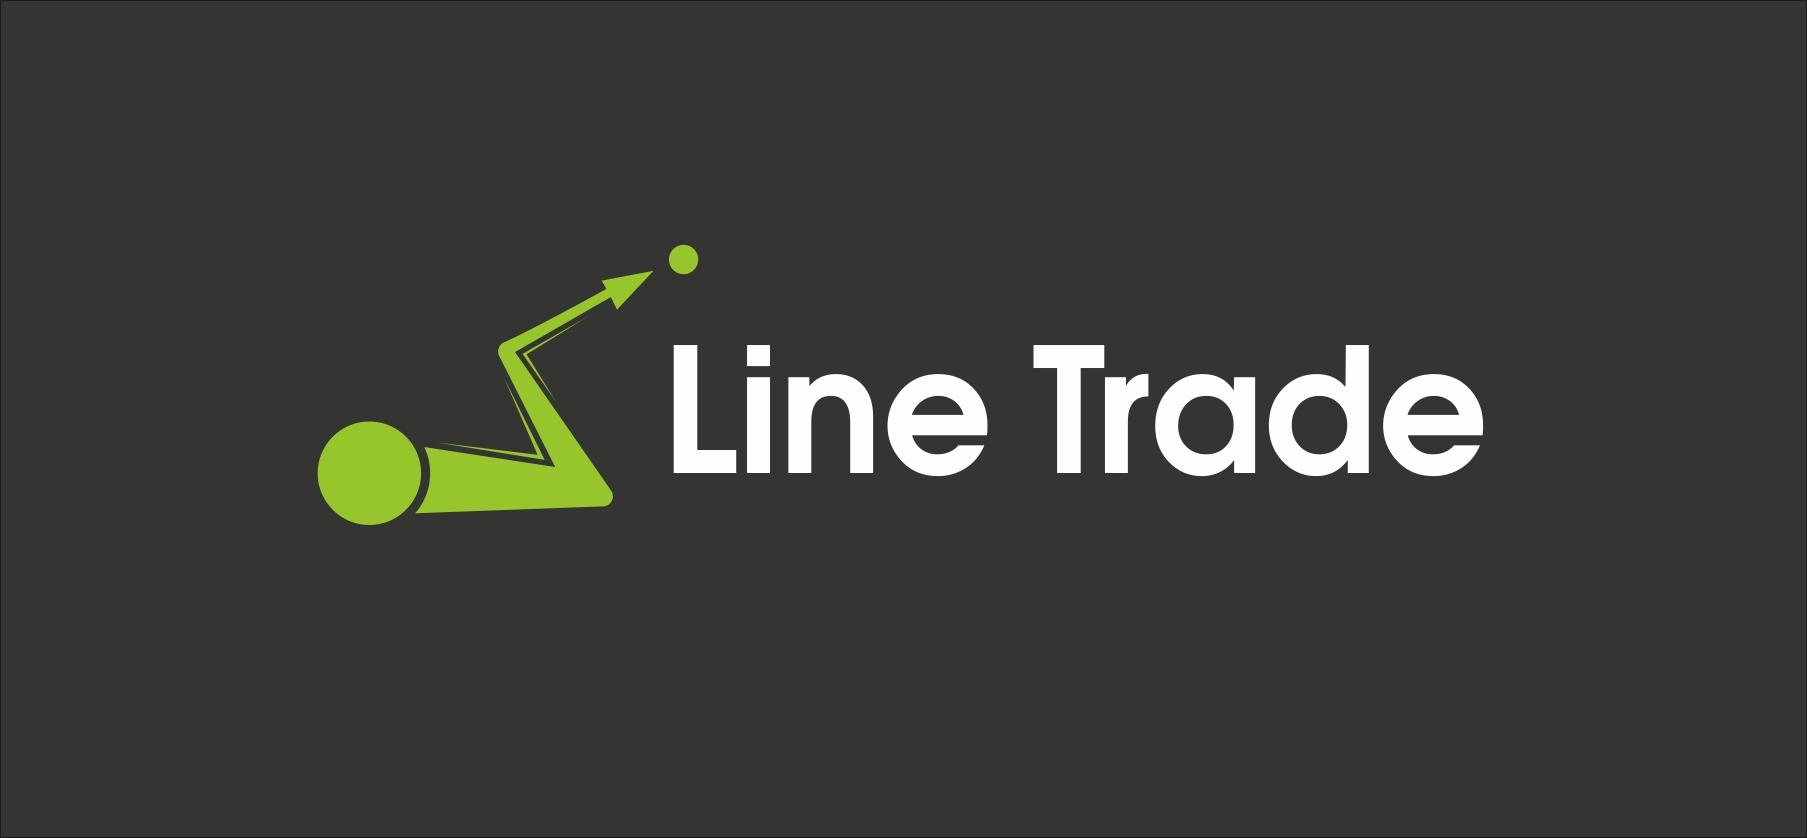 Разработка логотипа компании Line Trade фото f_26250fd0fb3ca7ac.jpg